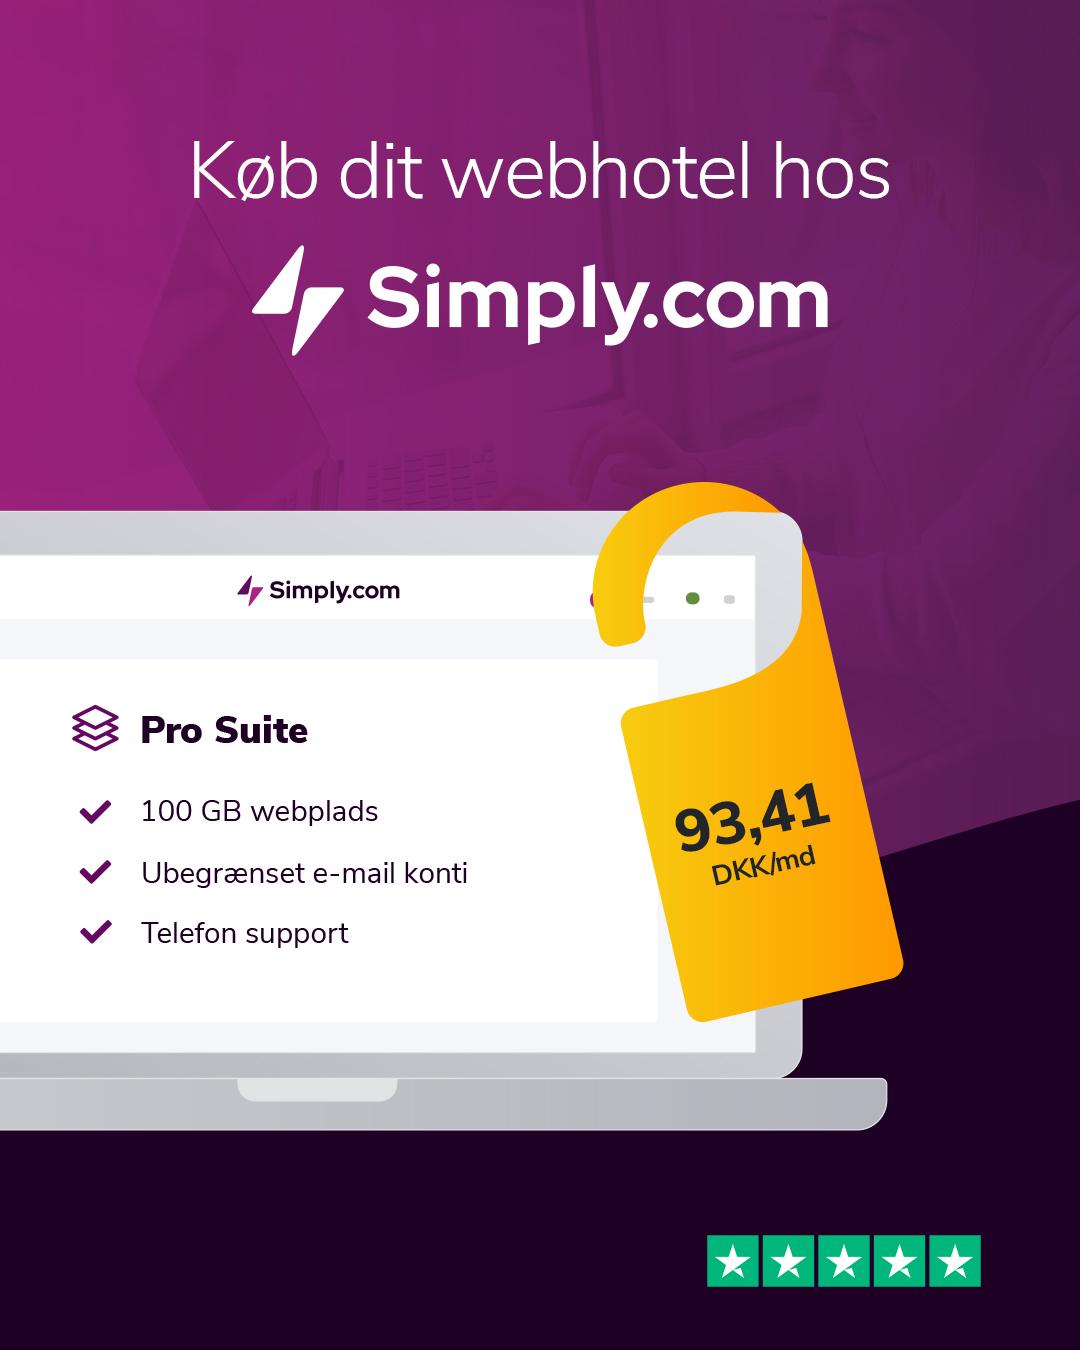 Simply.com webhotel